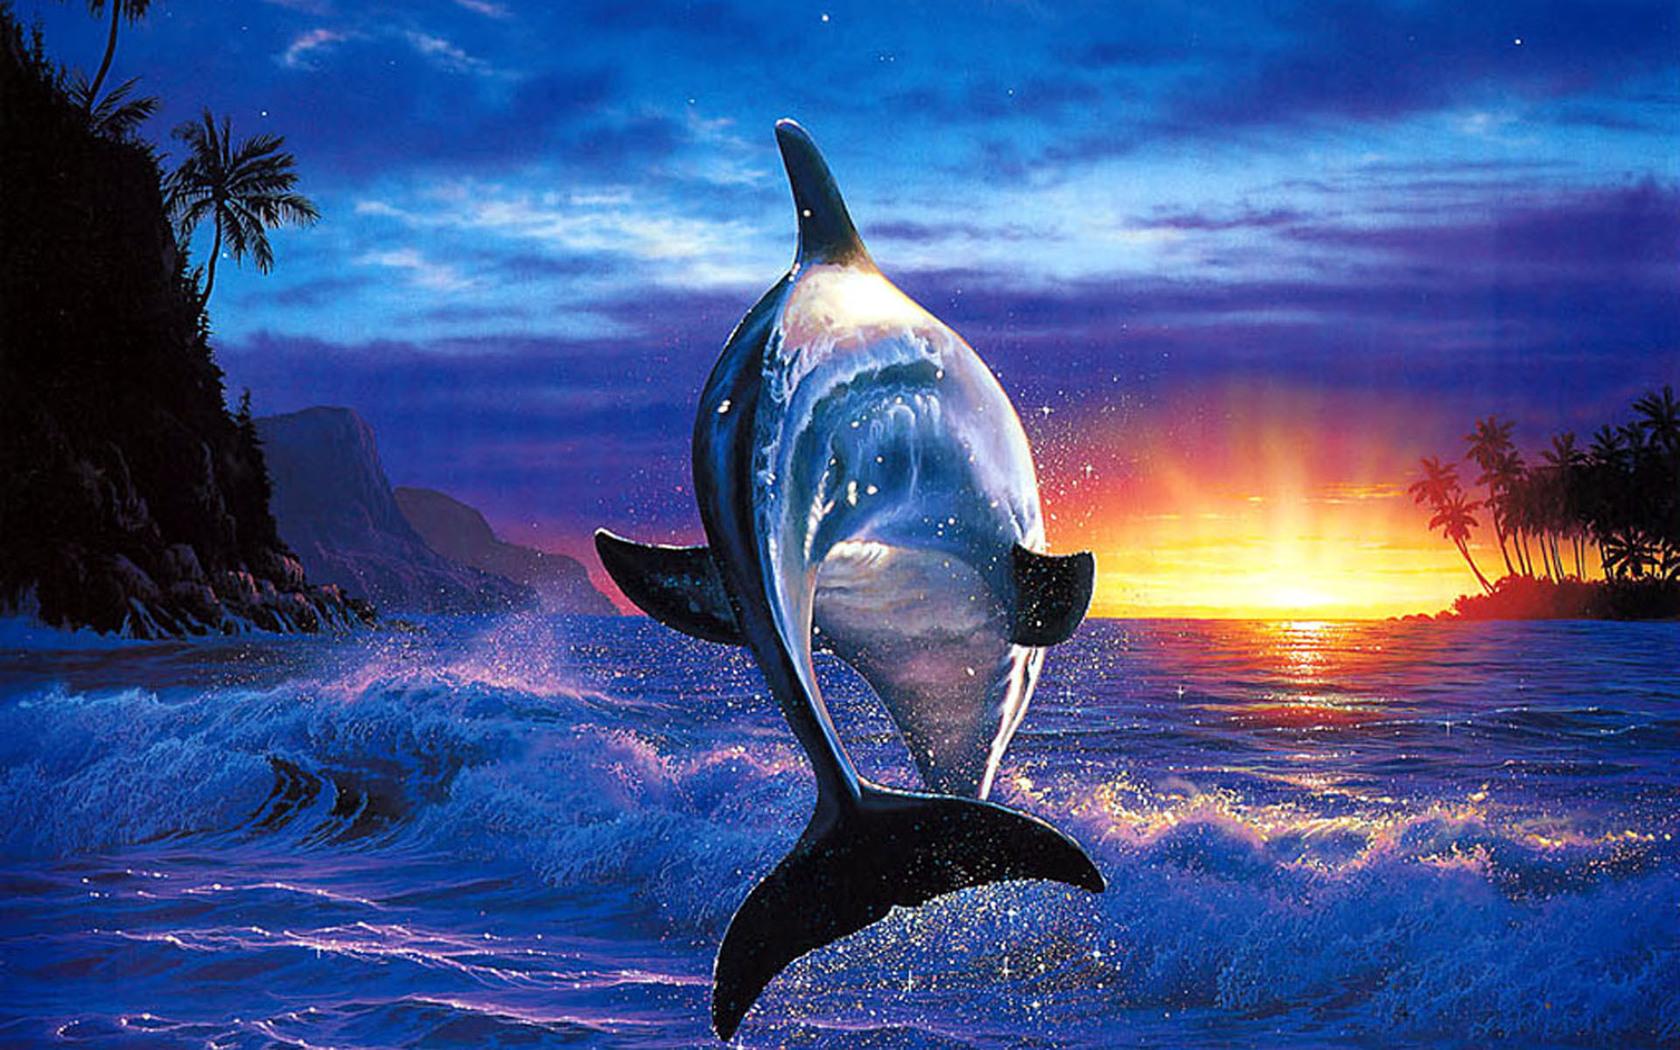 Dolphin wallpaper hd 1080p wallpapersafari hd wallpapers desktop page 101 1680x1050 voltagebd Image collections